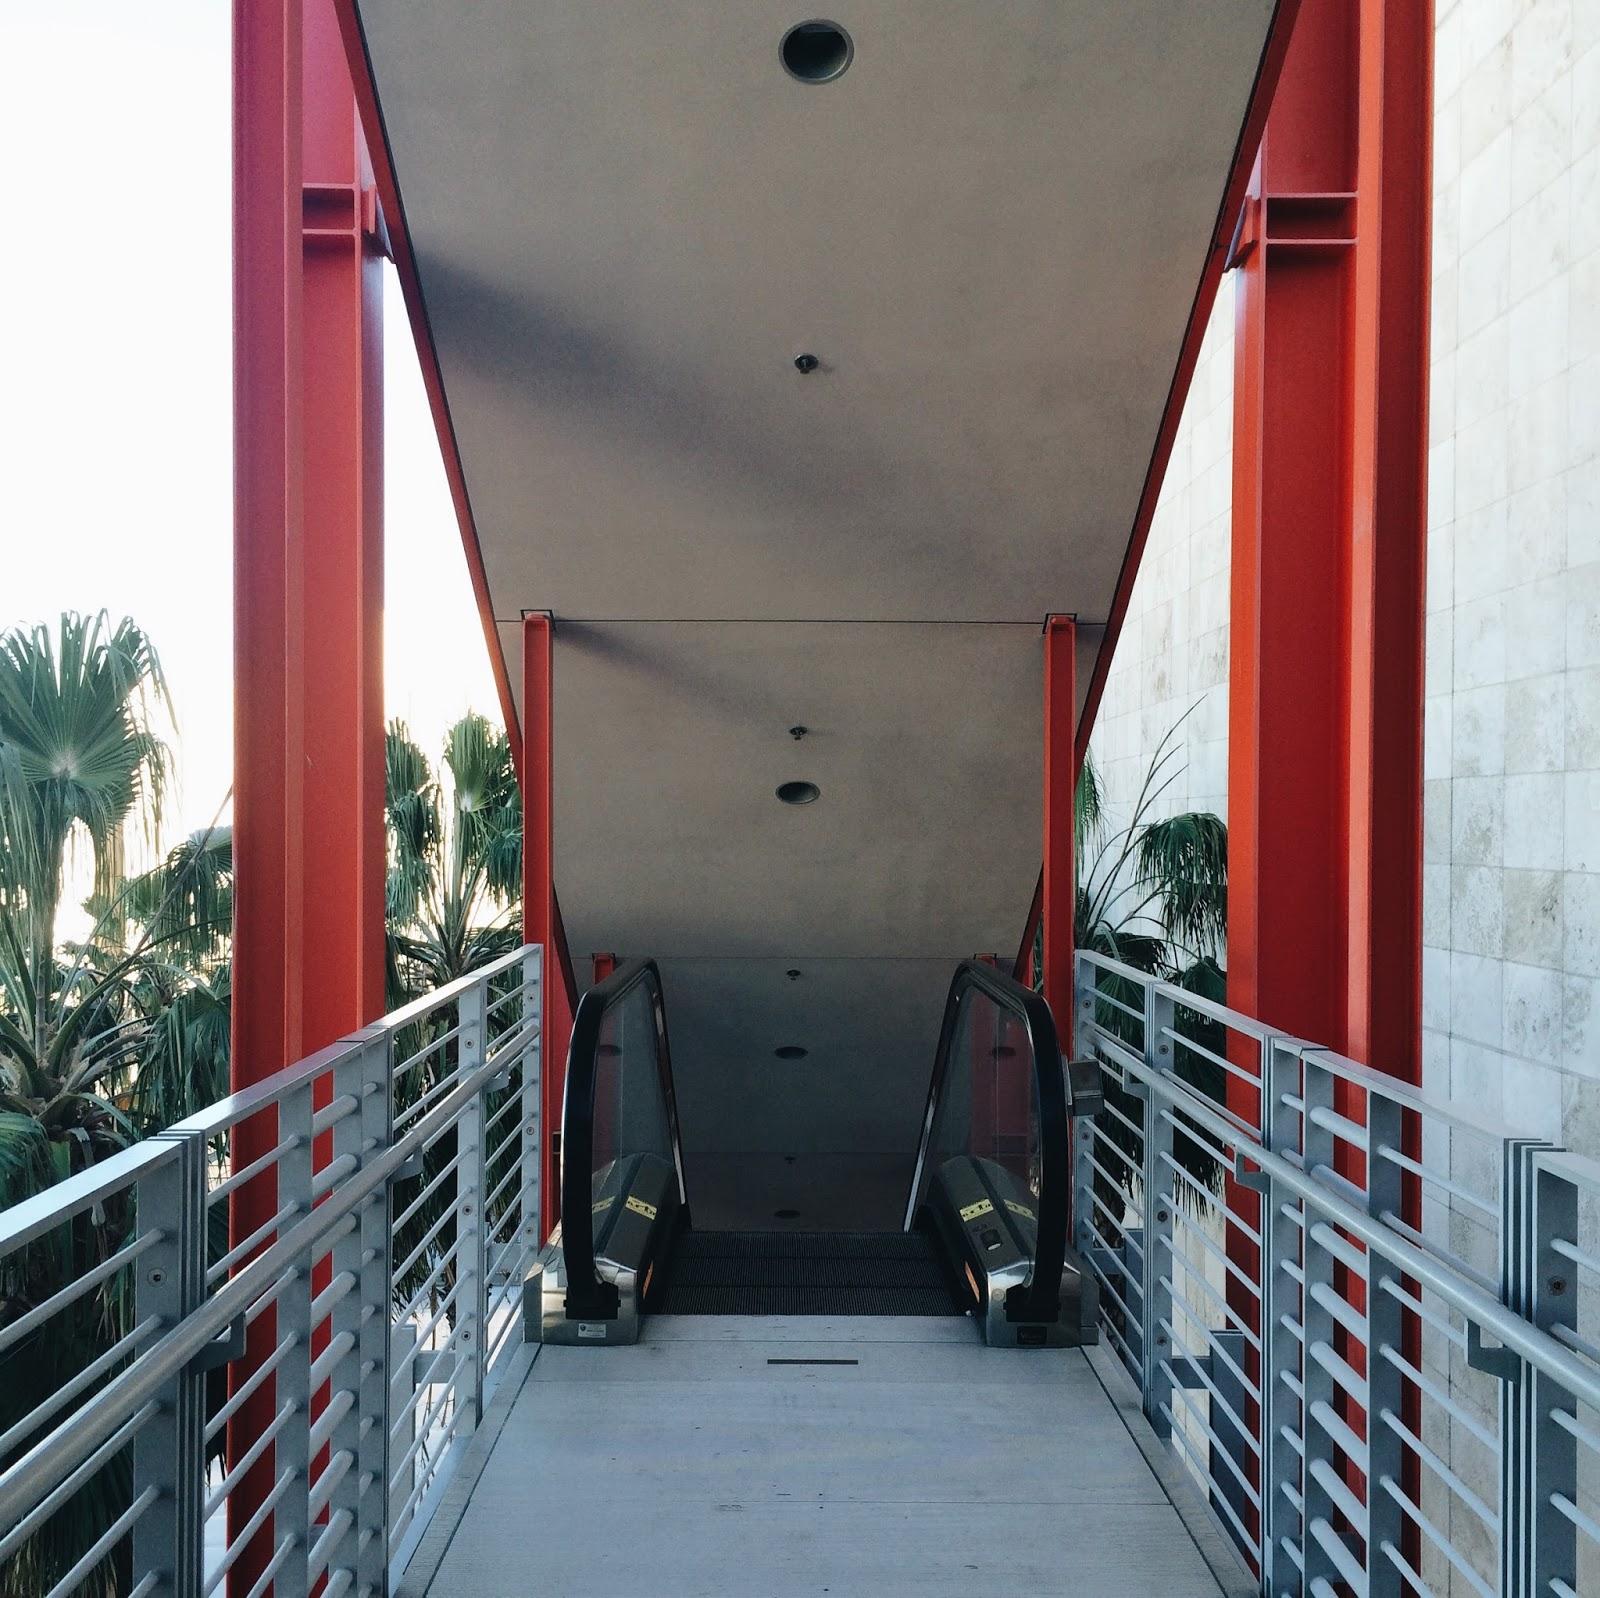 lacma-losangeles-escalator.JPG